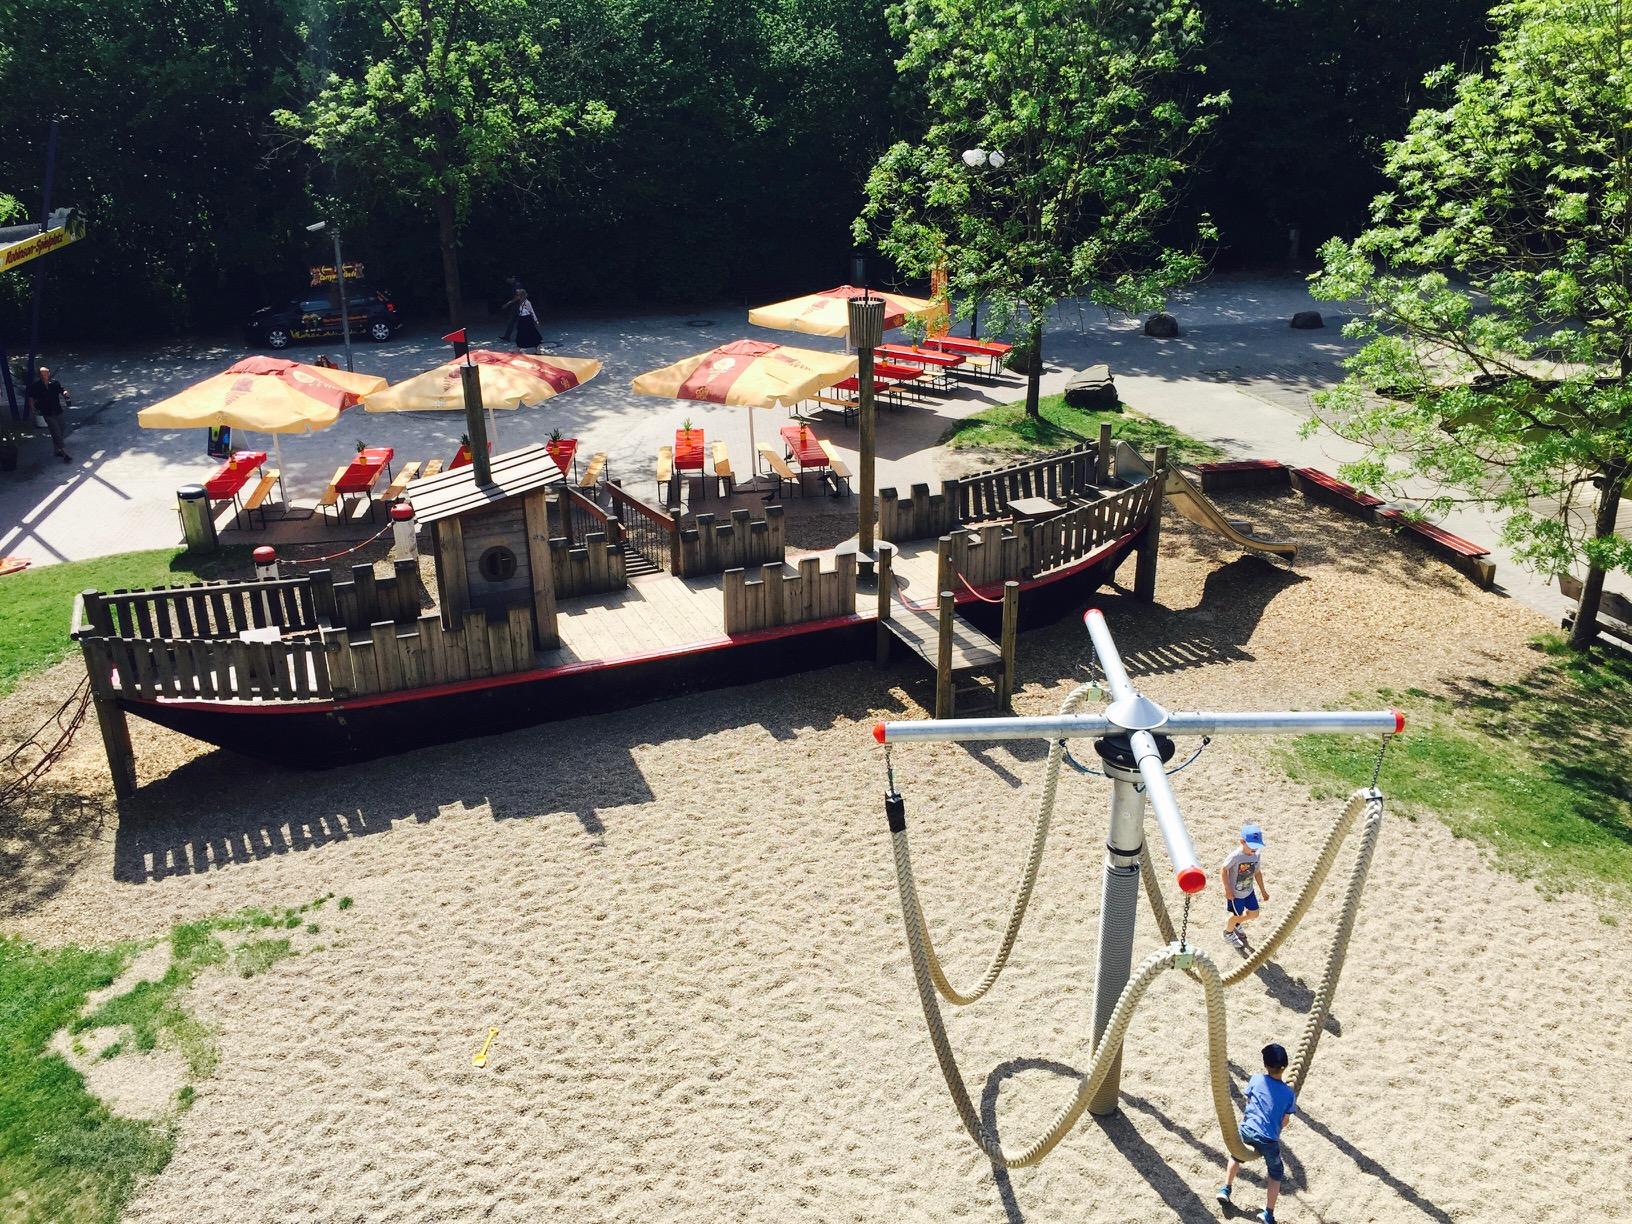 Blick auf das Piratenholzschiff im Westfalenpark Dortmund